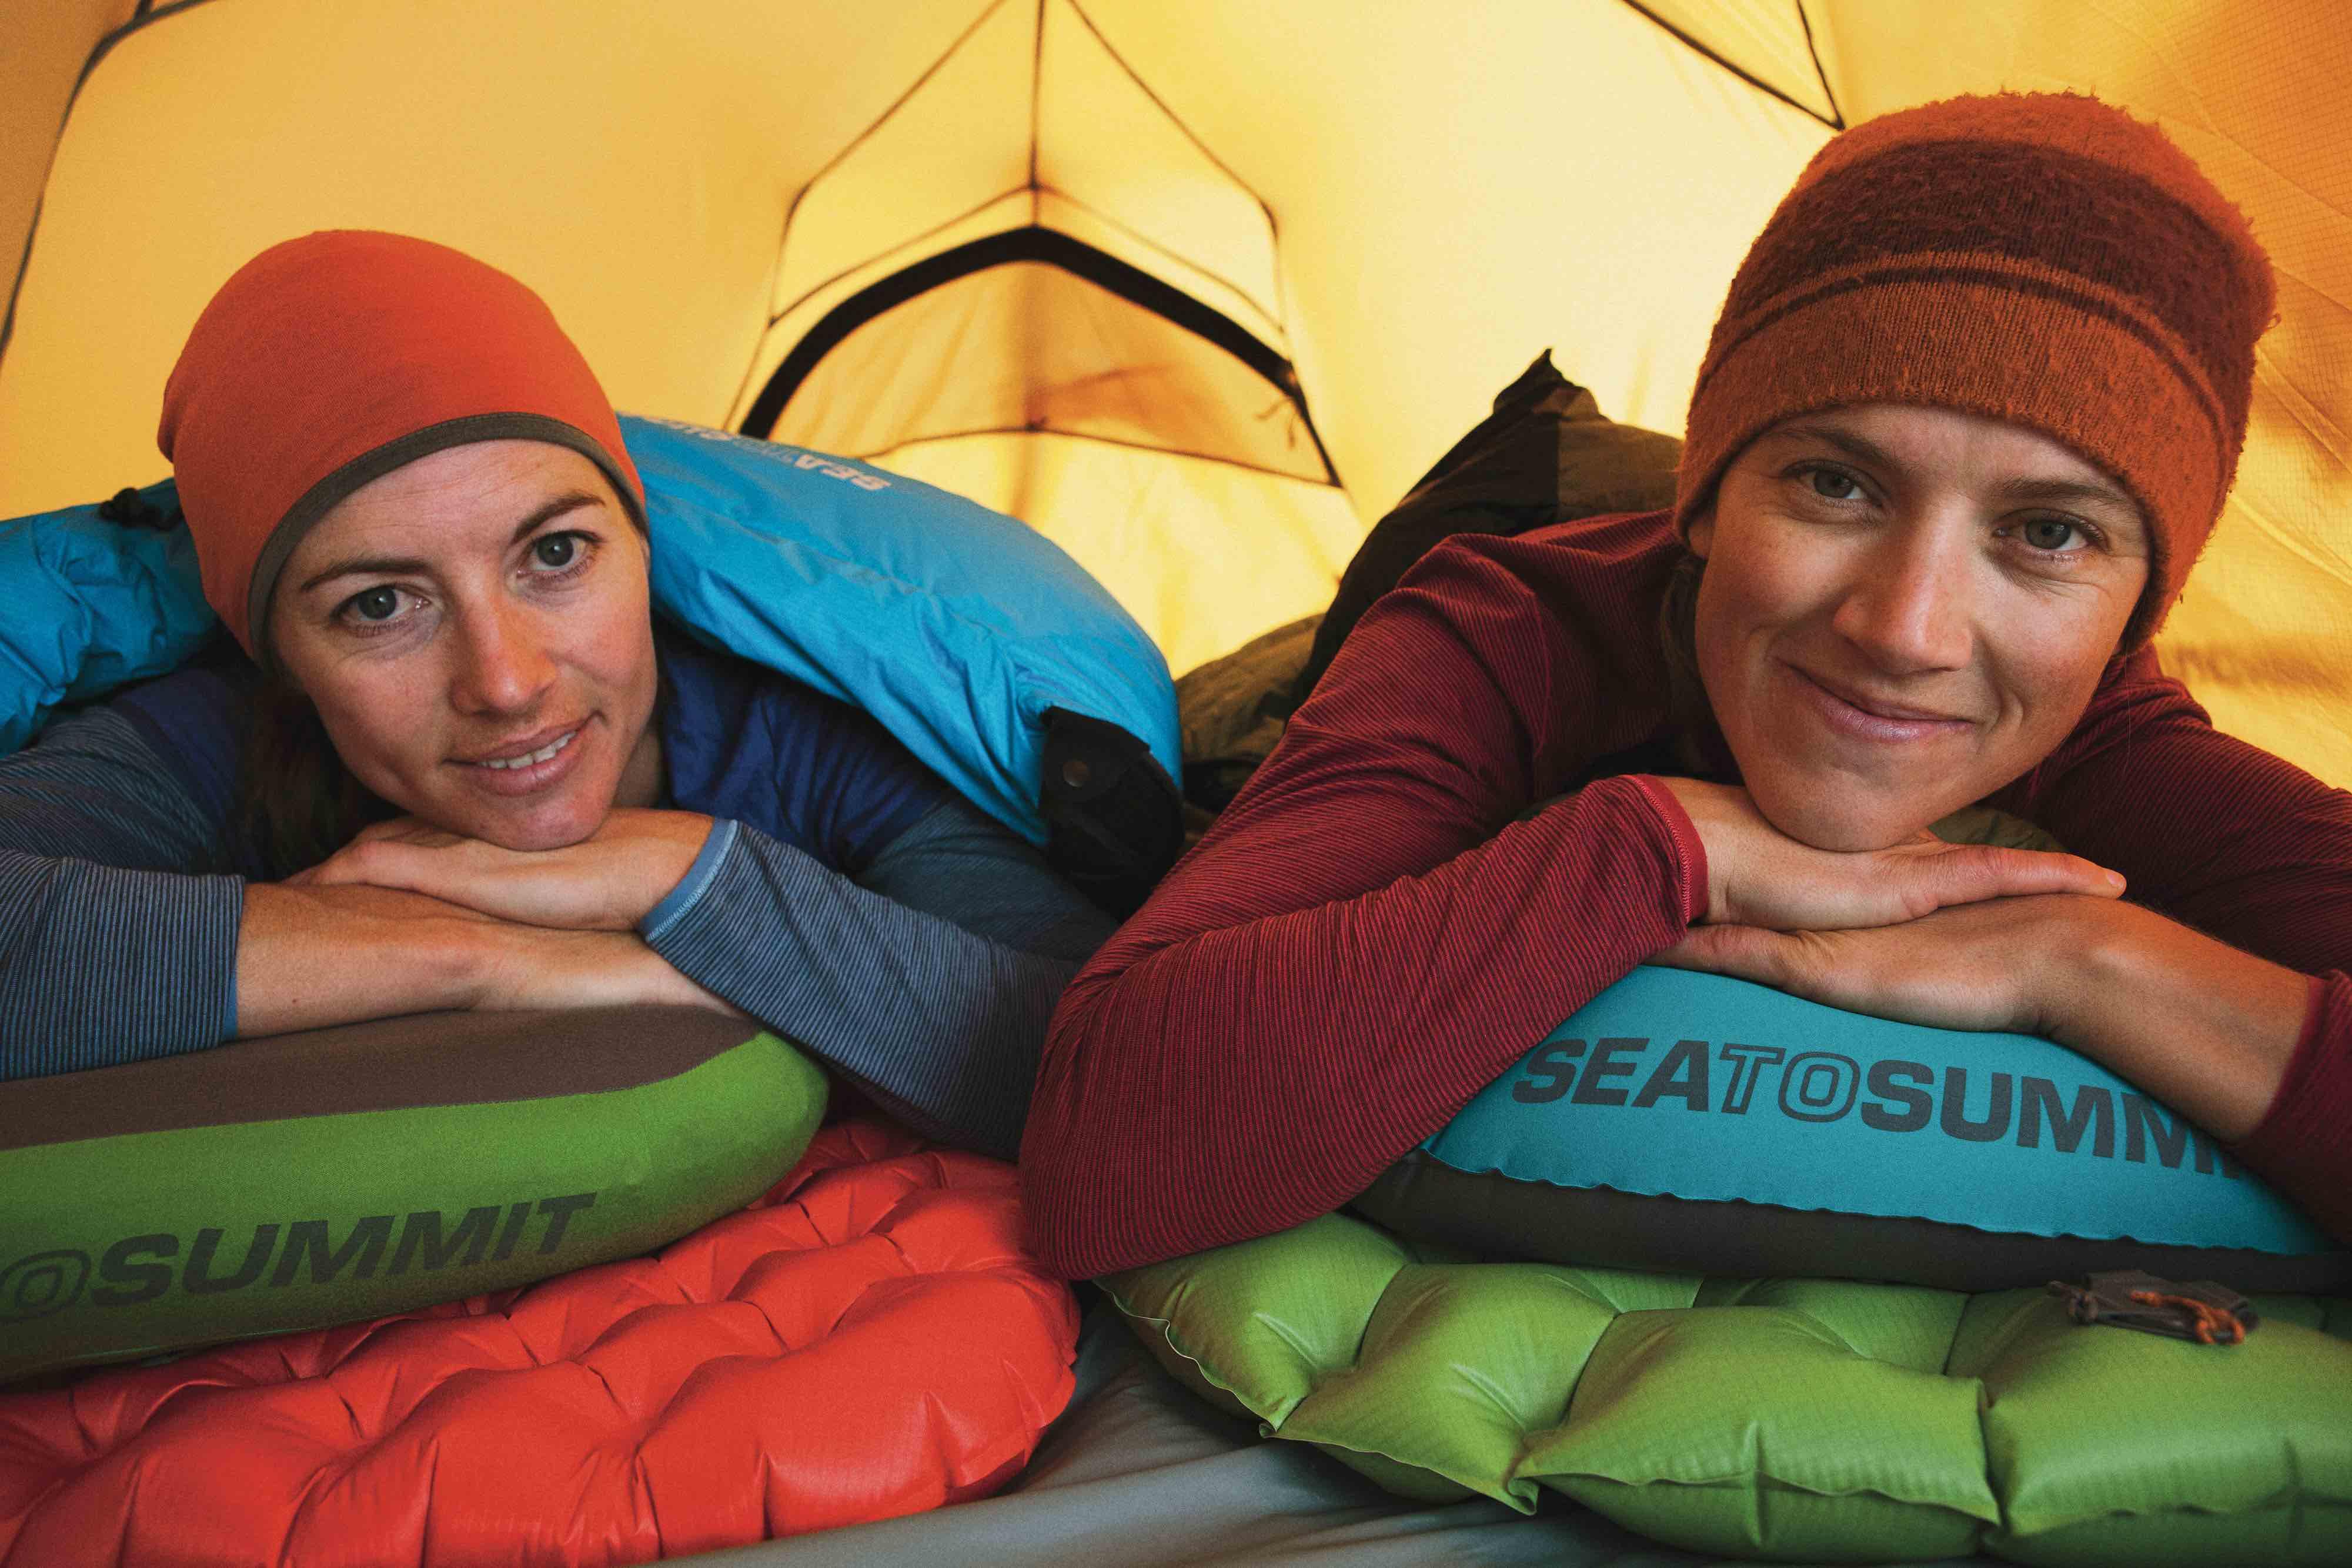 Win a Sea to Summit sleep system!